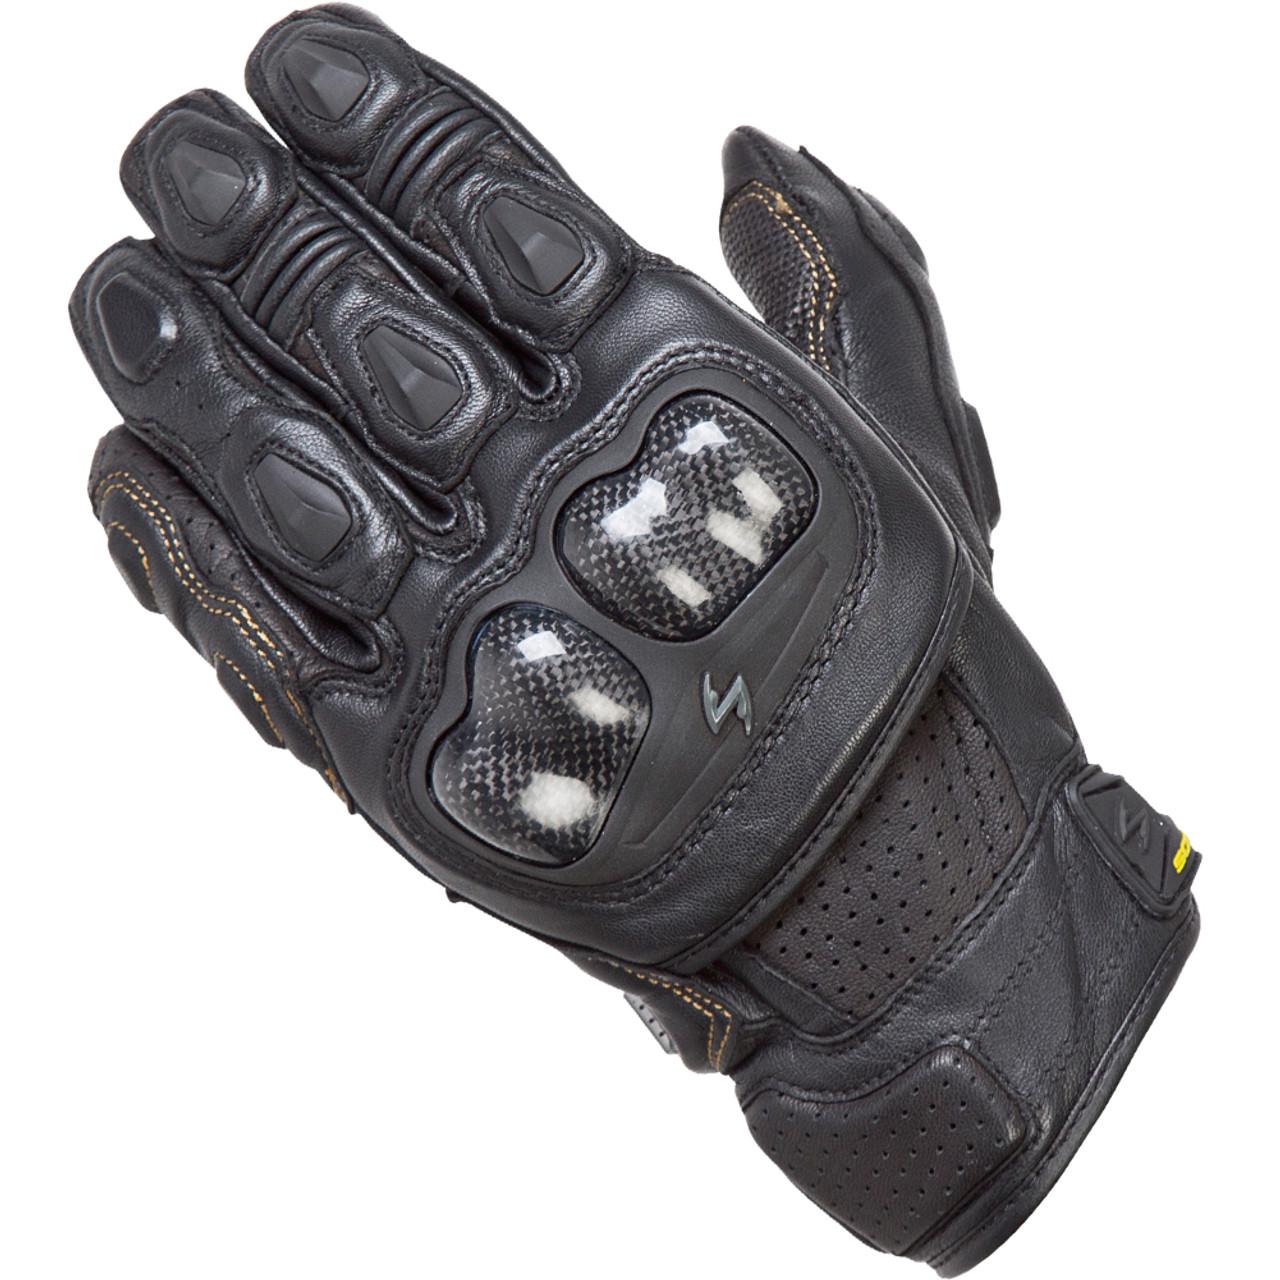 Scorpion Klaw II Short Cuff Leather//Mesh Glove Motorcycle Street Bike